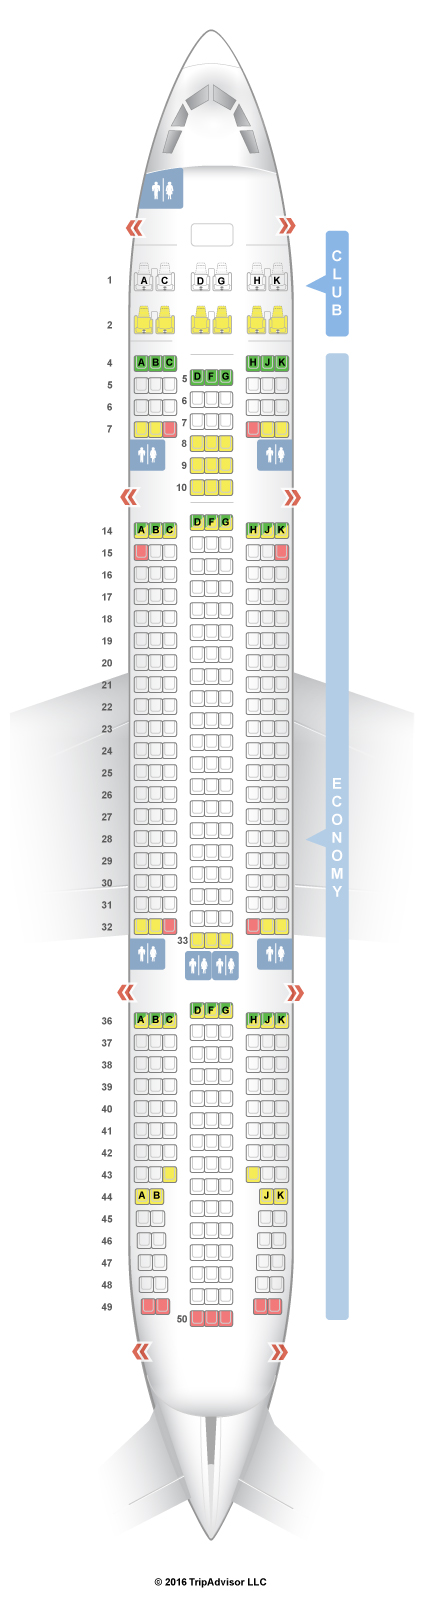 Seatguru Seat Map Air Transat Airbus A330 200 332 New